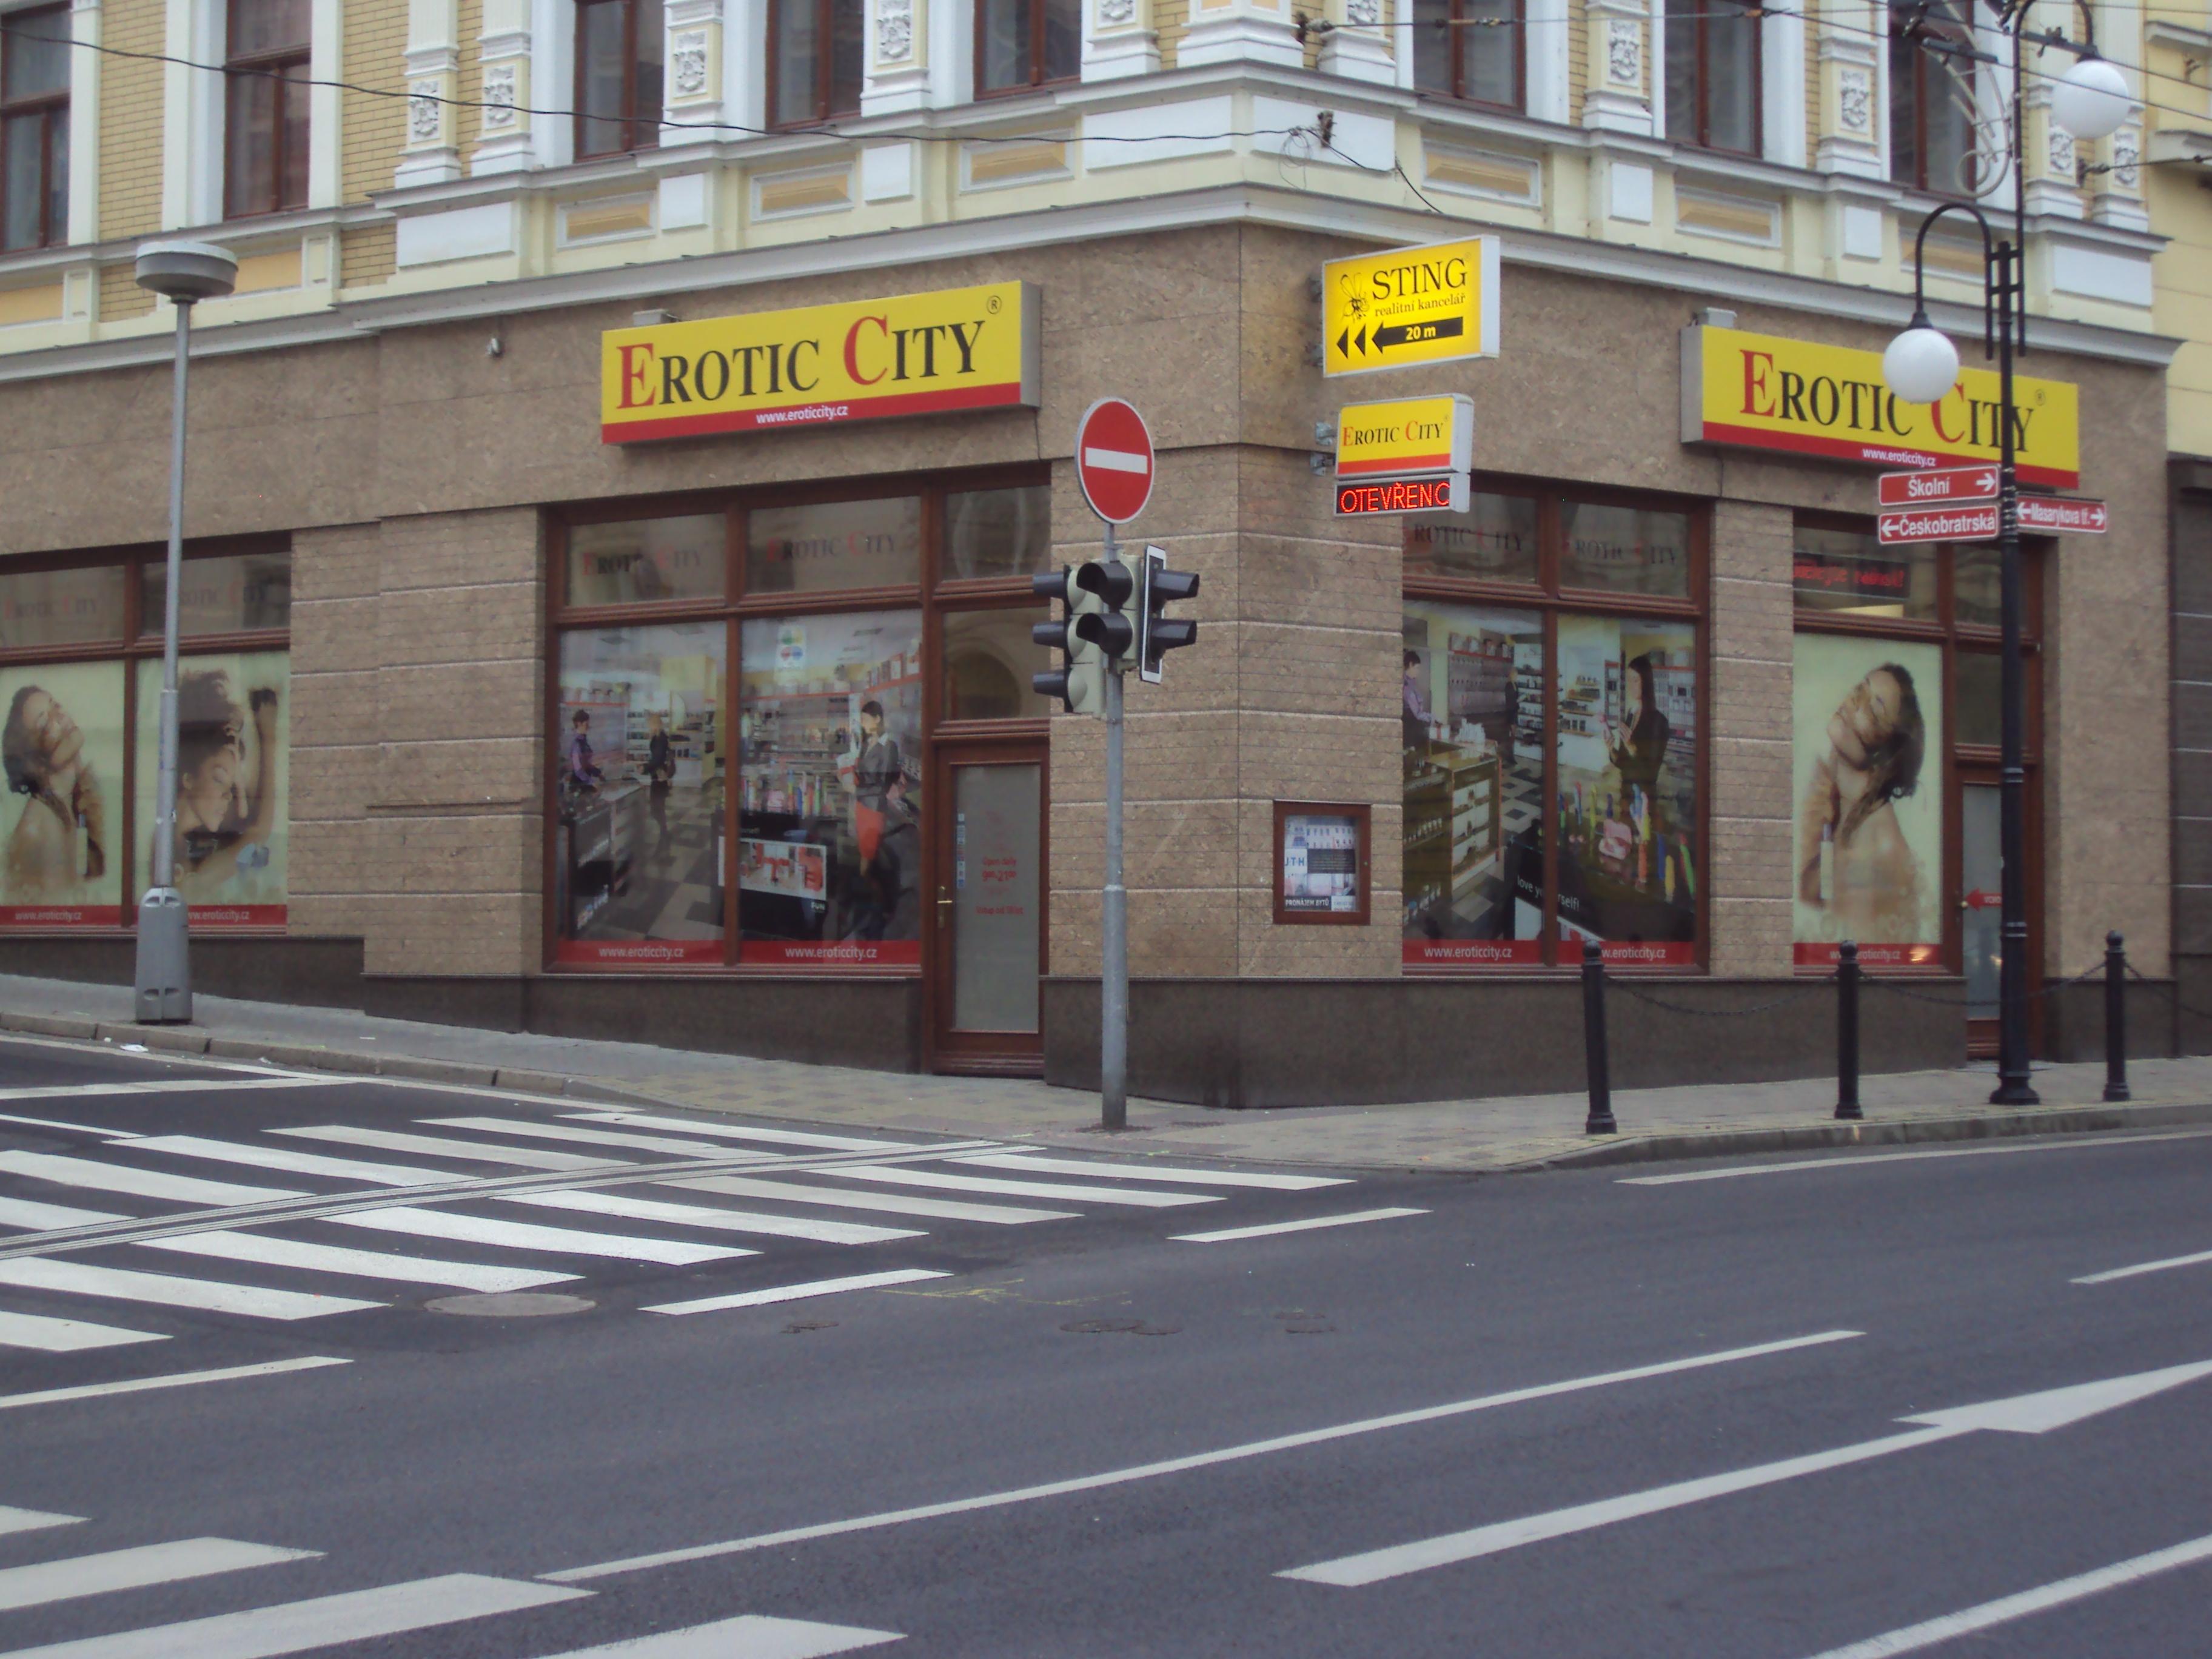 File:Teplice Erotic City.JPG - Wikimedia Commons